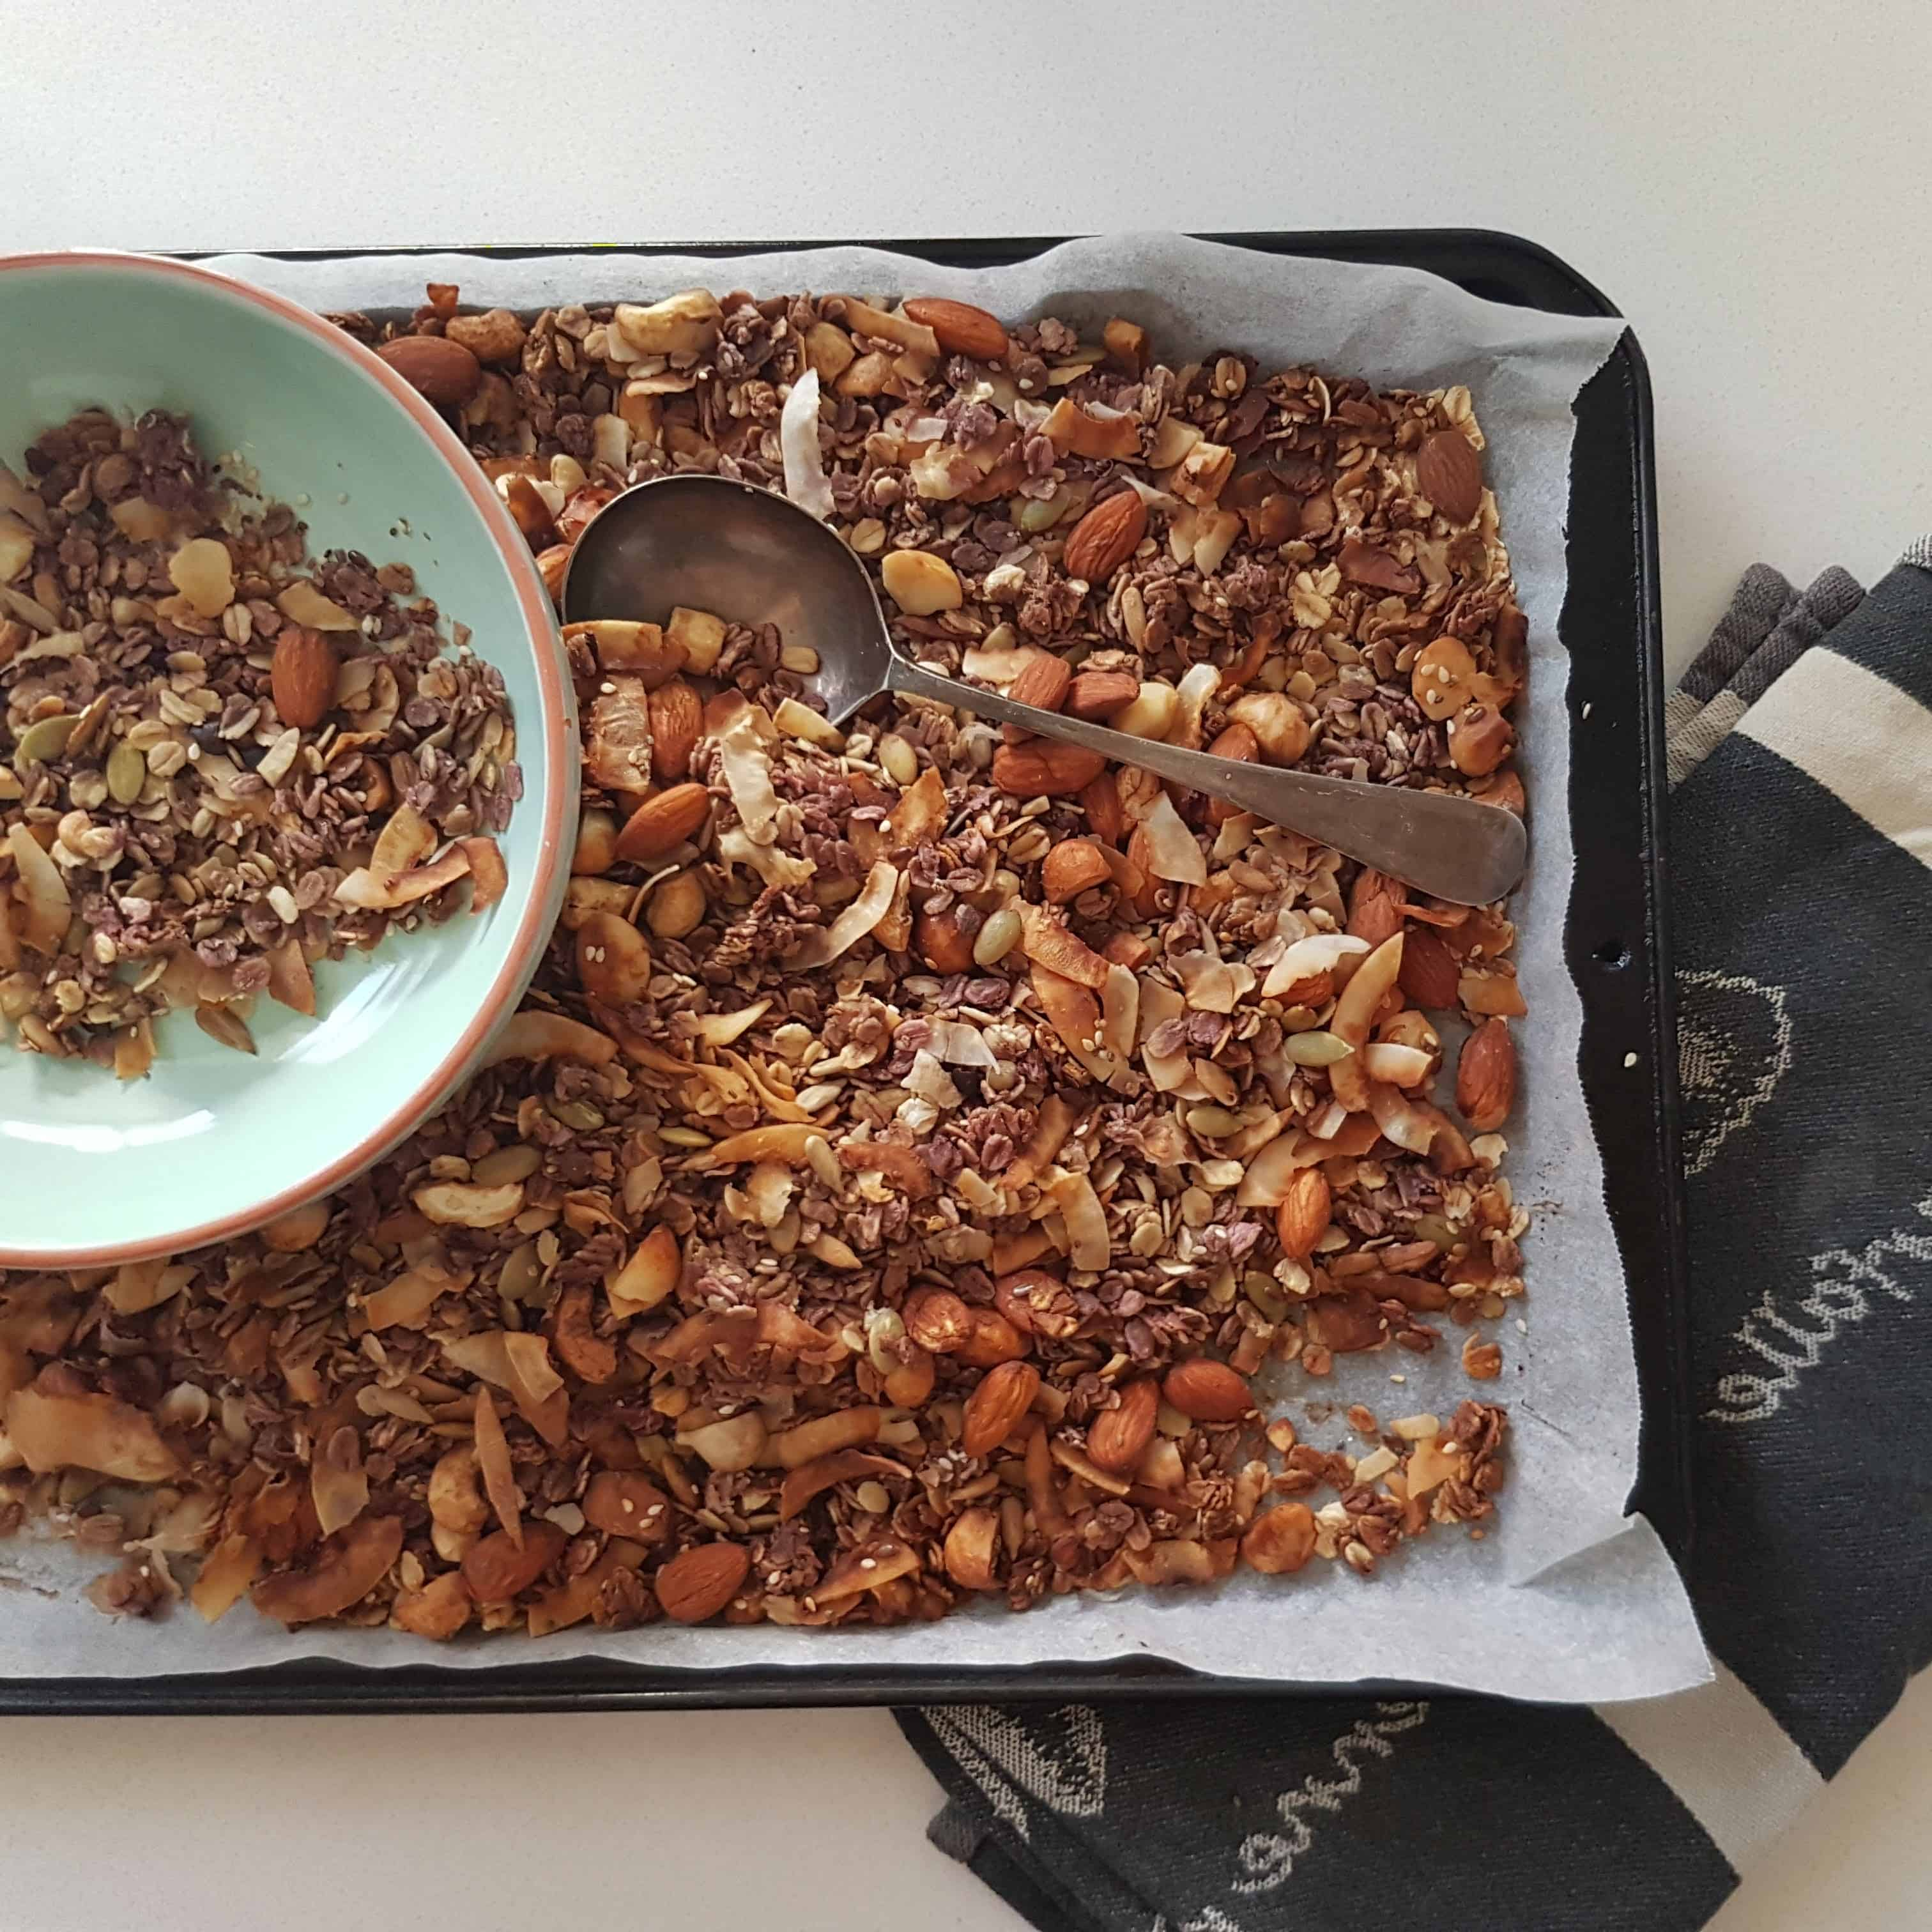 A tray of freshy made muesli